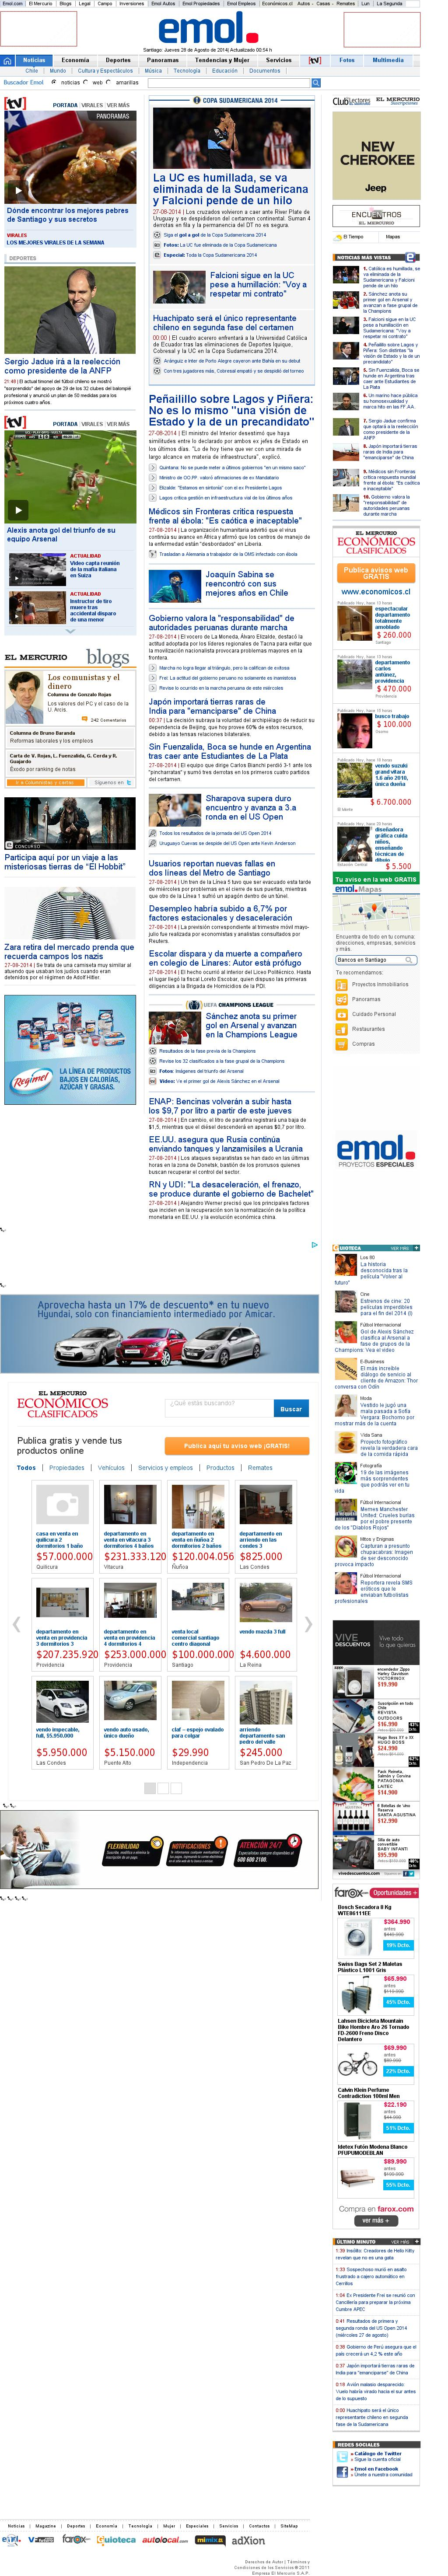 emol at Thursday Aug. 28, 2014, 6:06 a.m. UTC